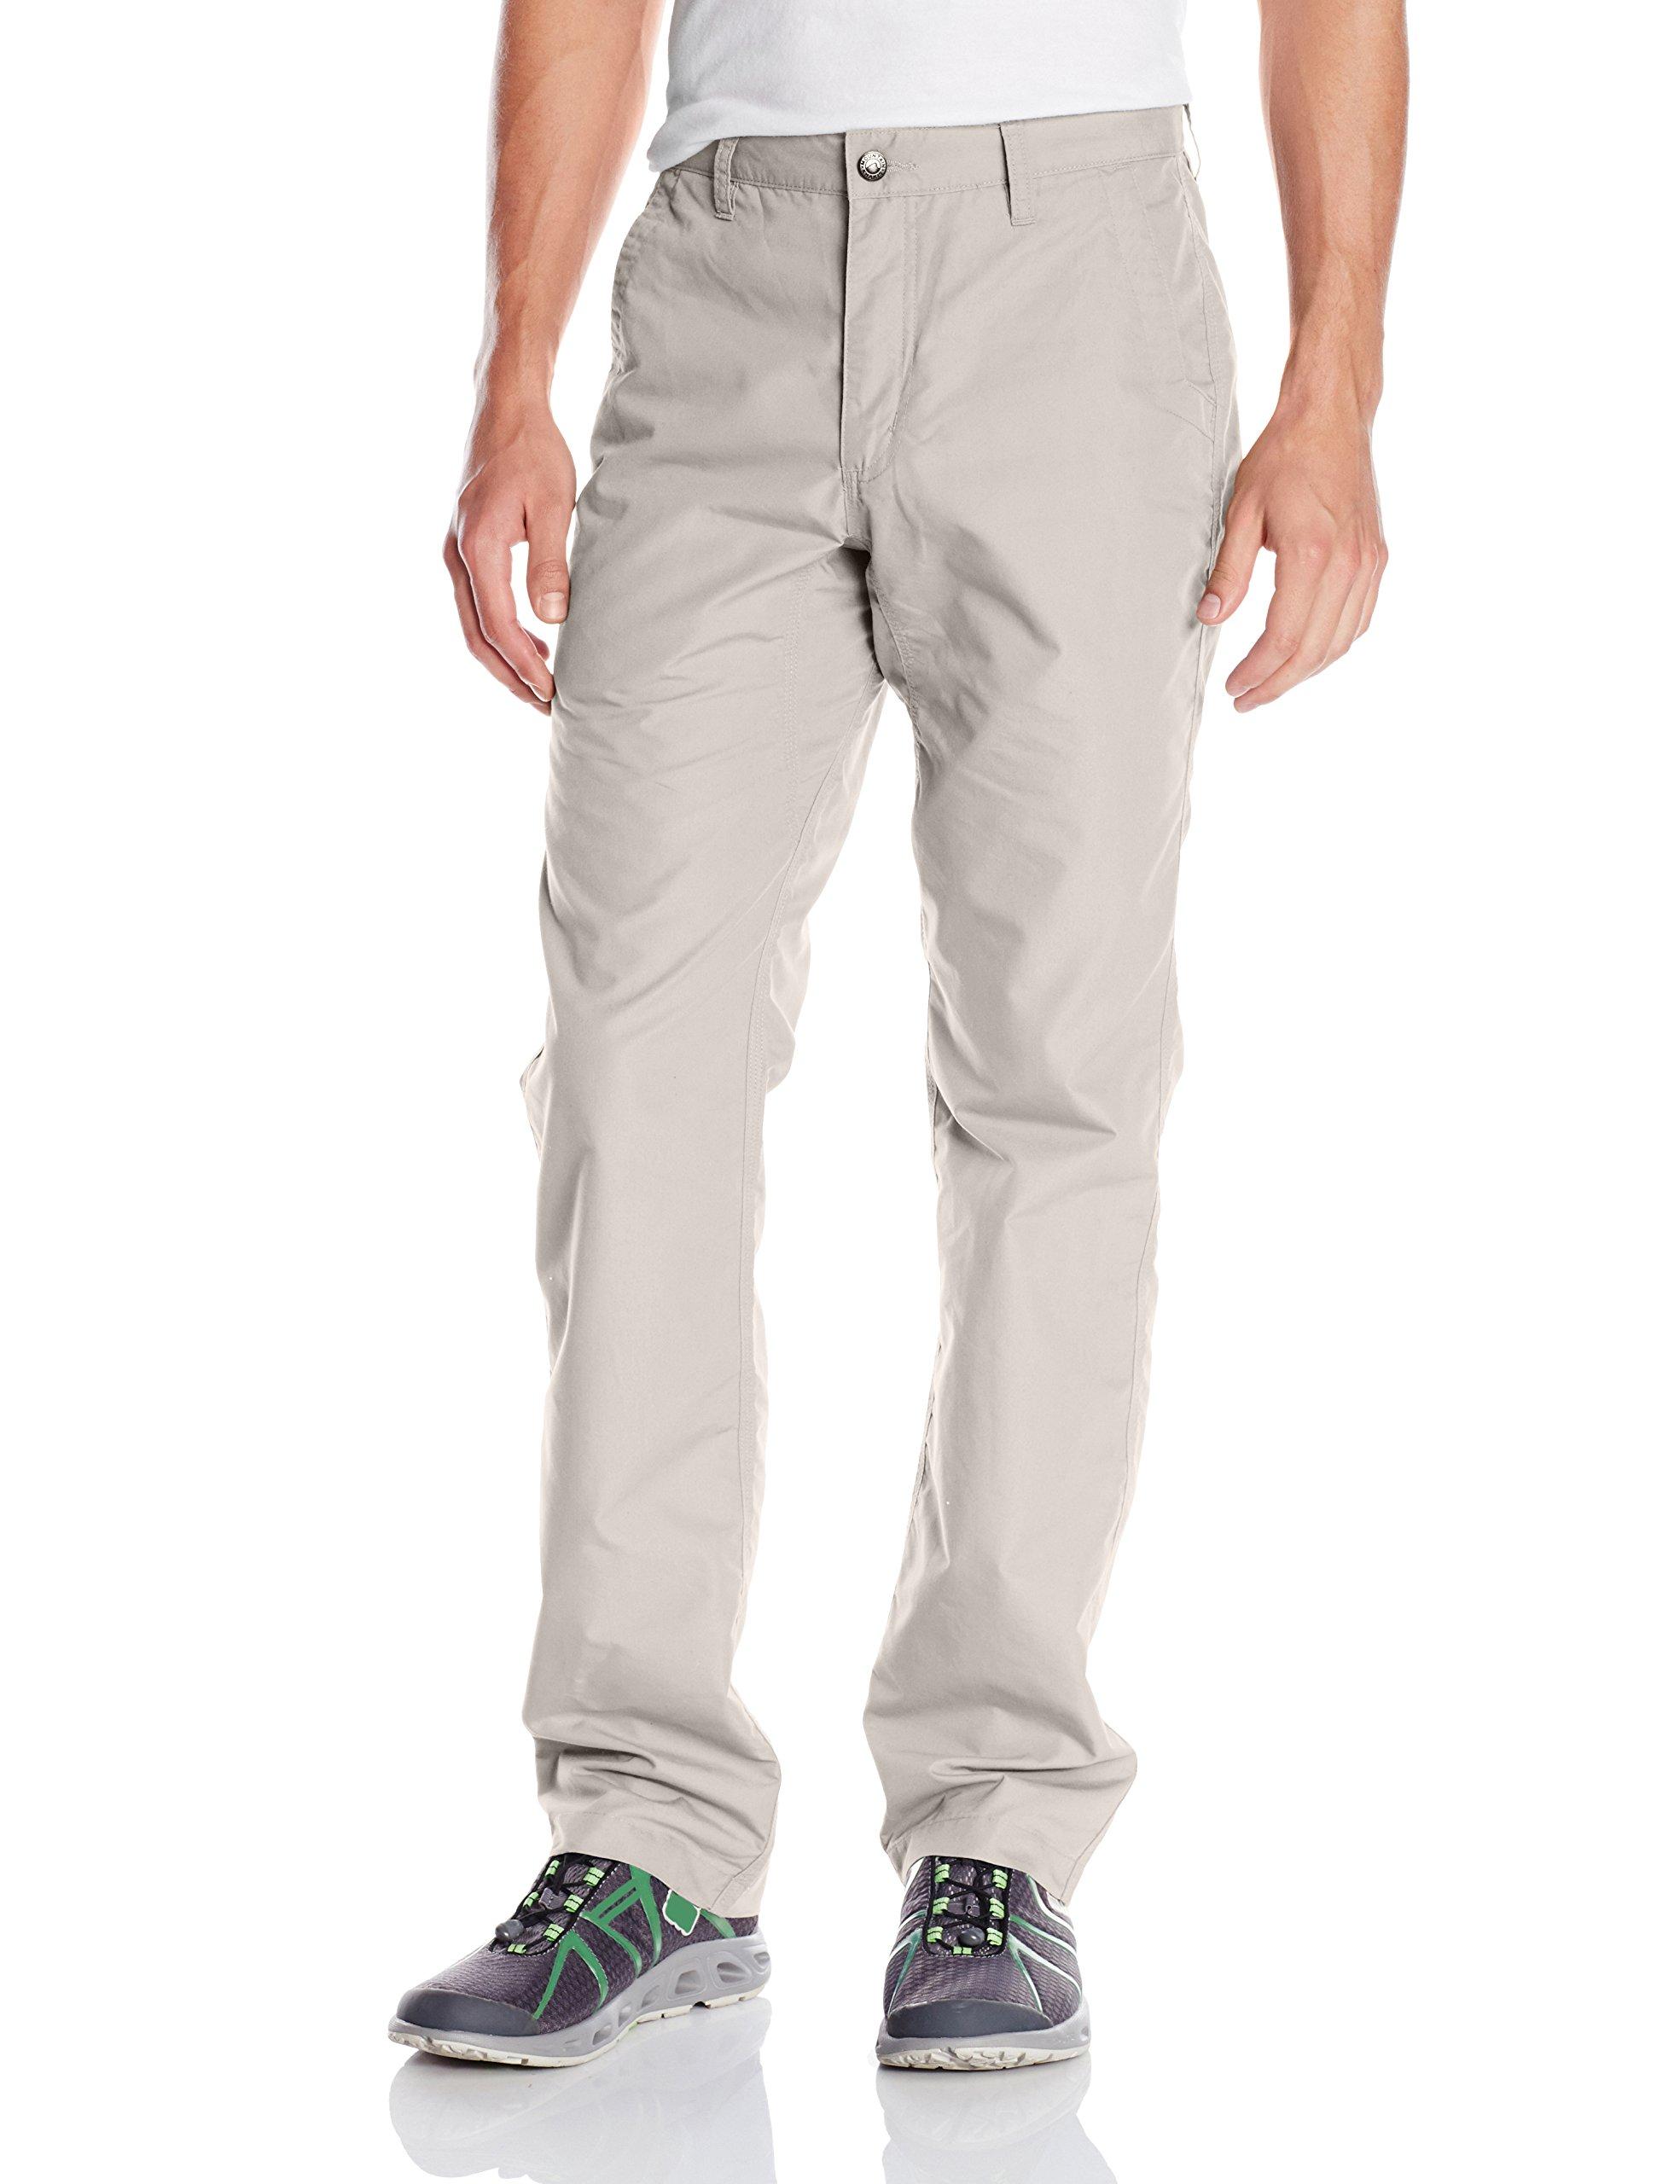 Mountain Khakis Men's Poplin Pant Slim Fit, Oatmeal, 36W/30-Inch